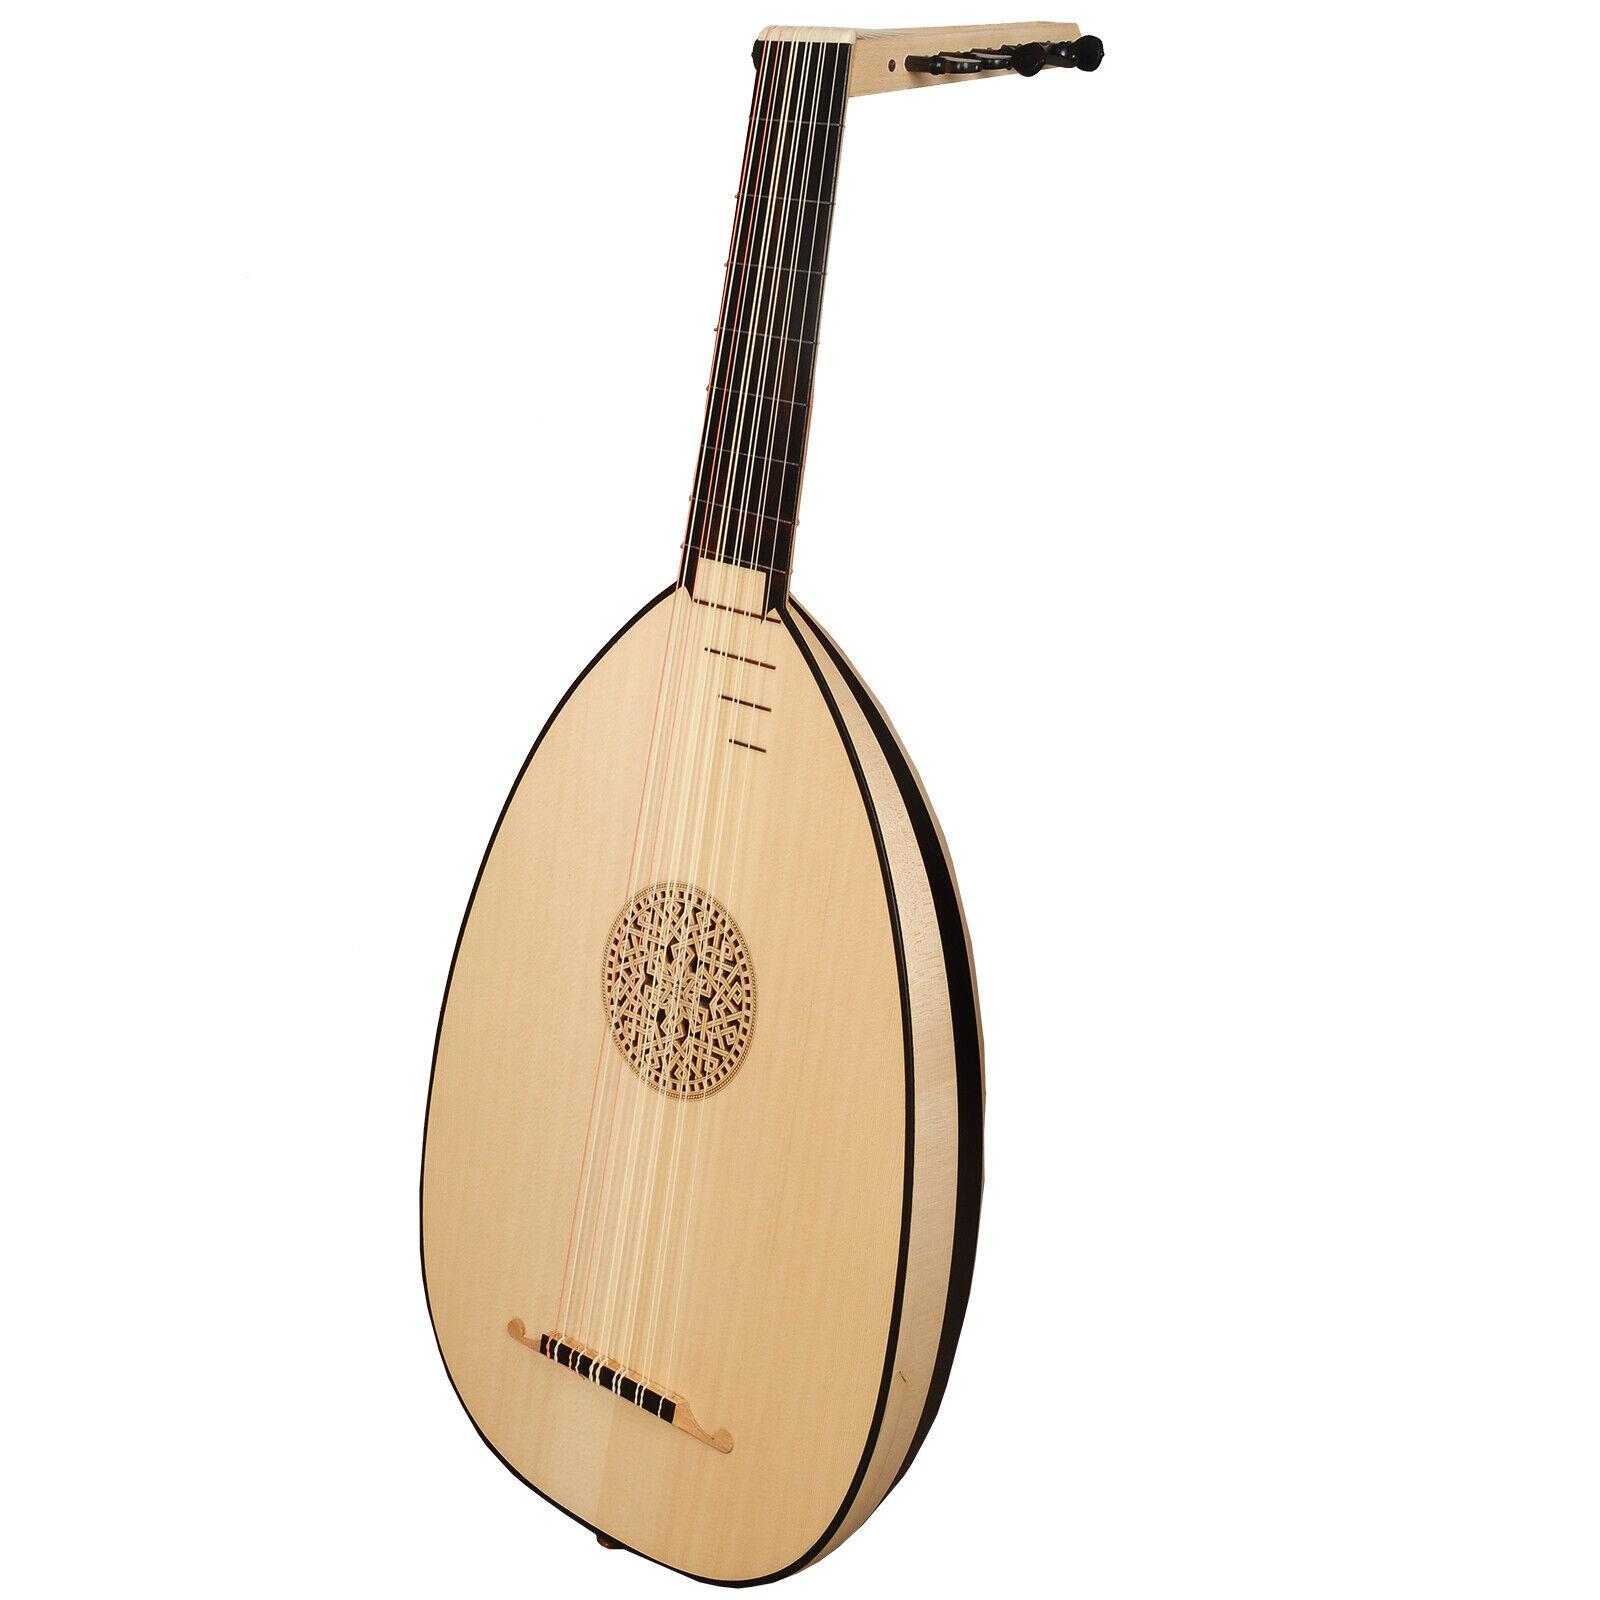 Muzikkon 6 Course Heartland Renaissance Lute Variegated Maple and Ebony